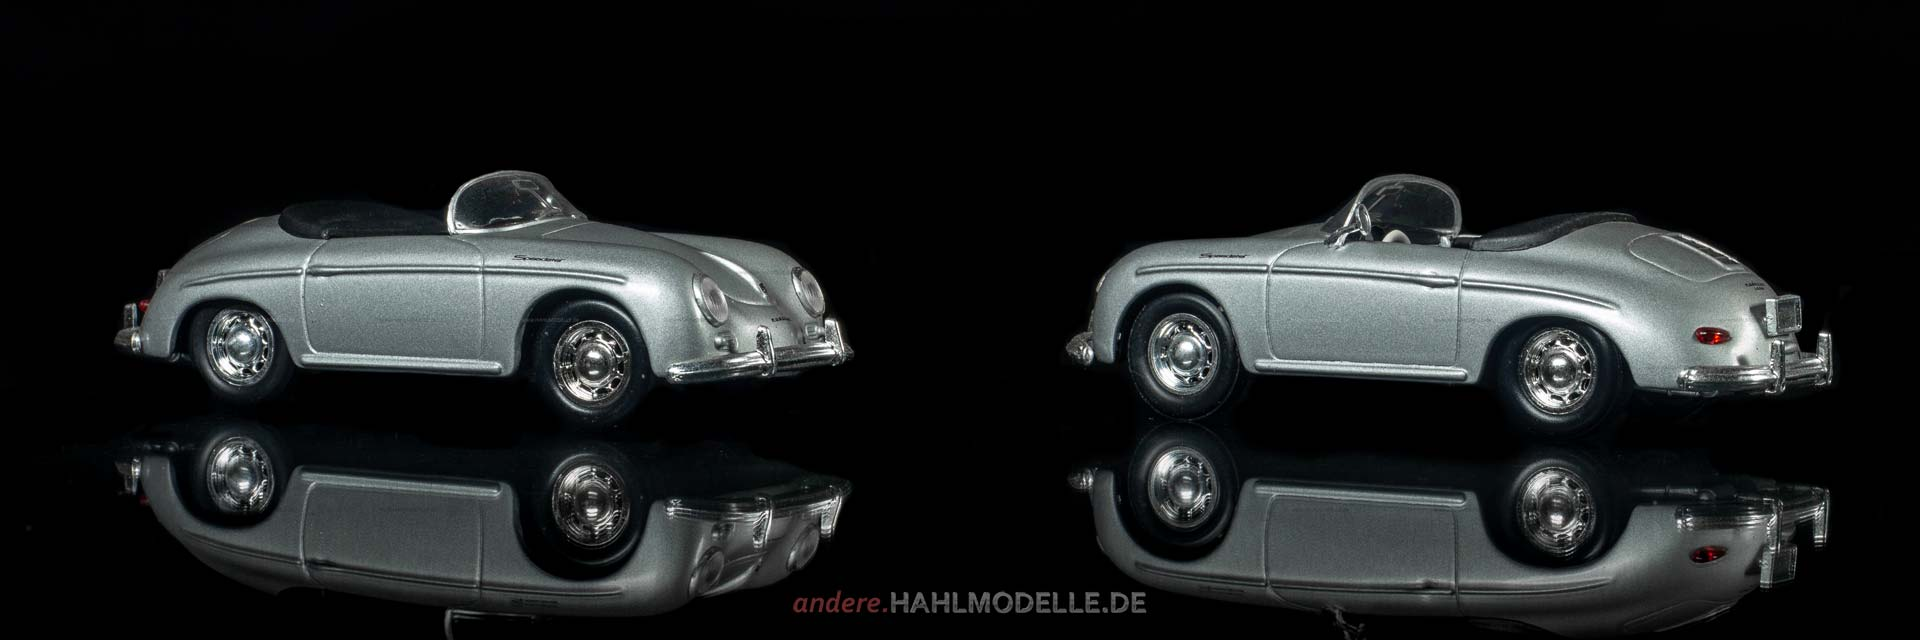 Porsche 356 A | Roadster | Ixo | 1:43 | www.andere.hahlmodelle.de